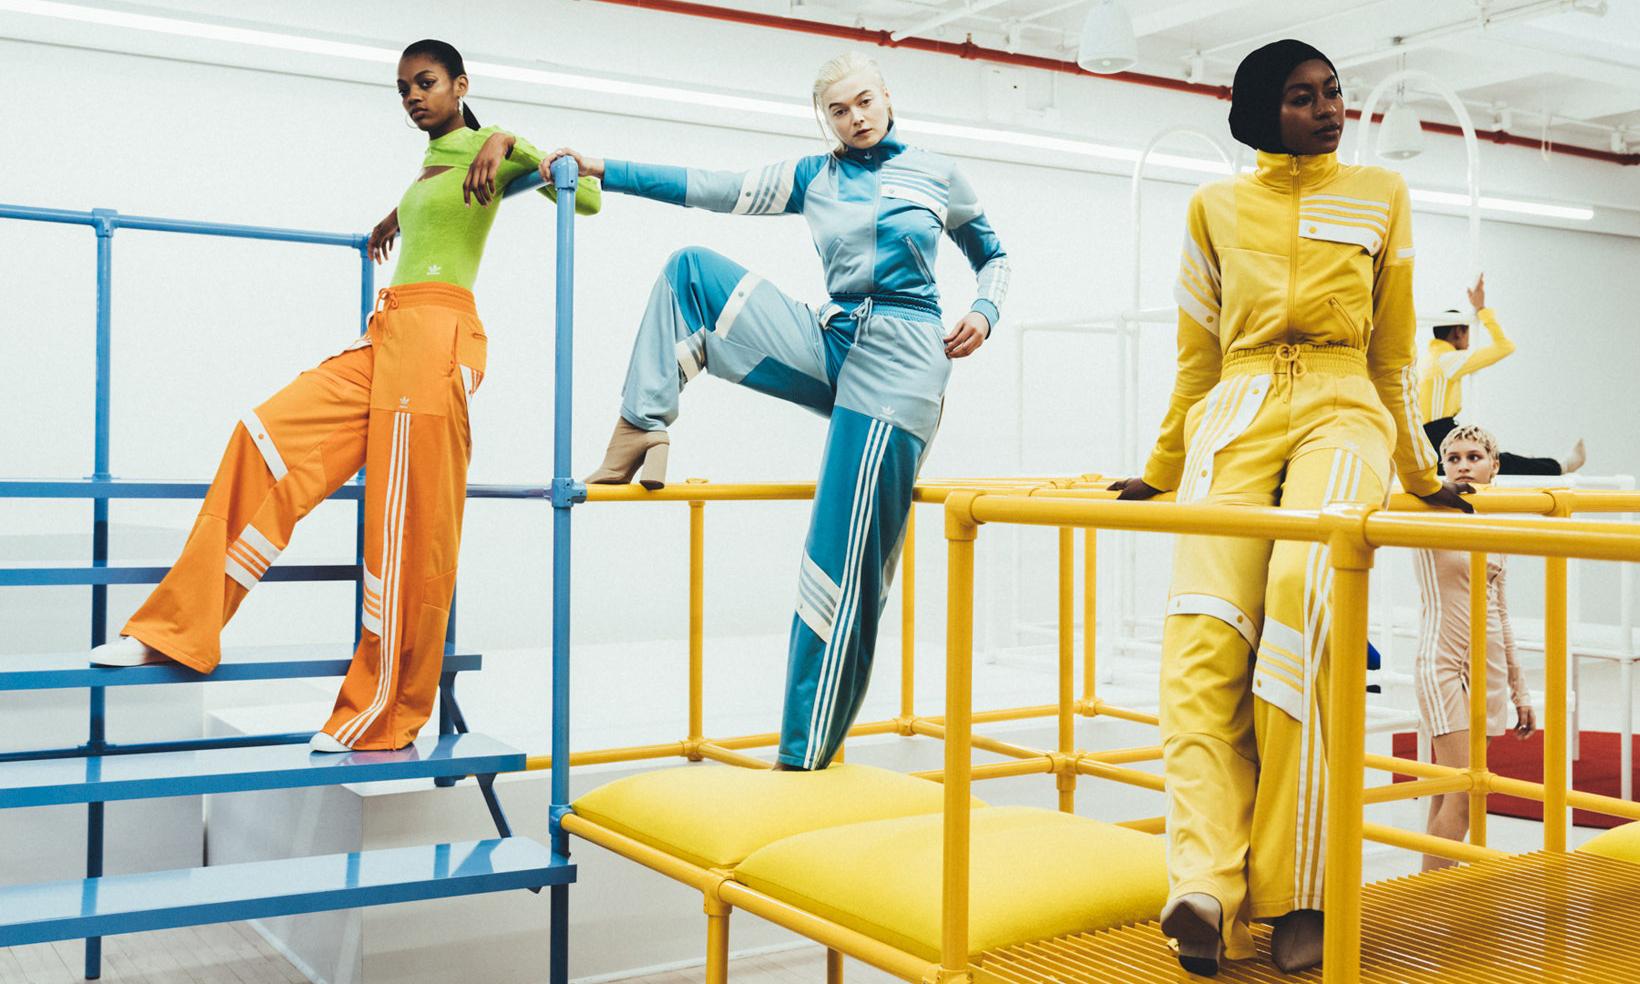 Daniëlle Cathari x adidas Originals 联乘系列亮相纽约时装周